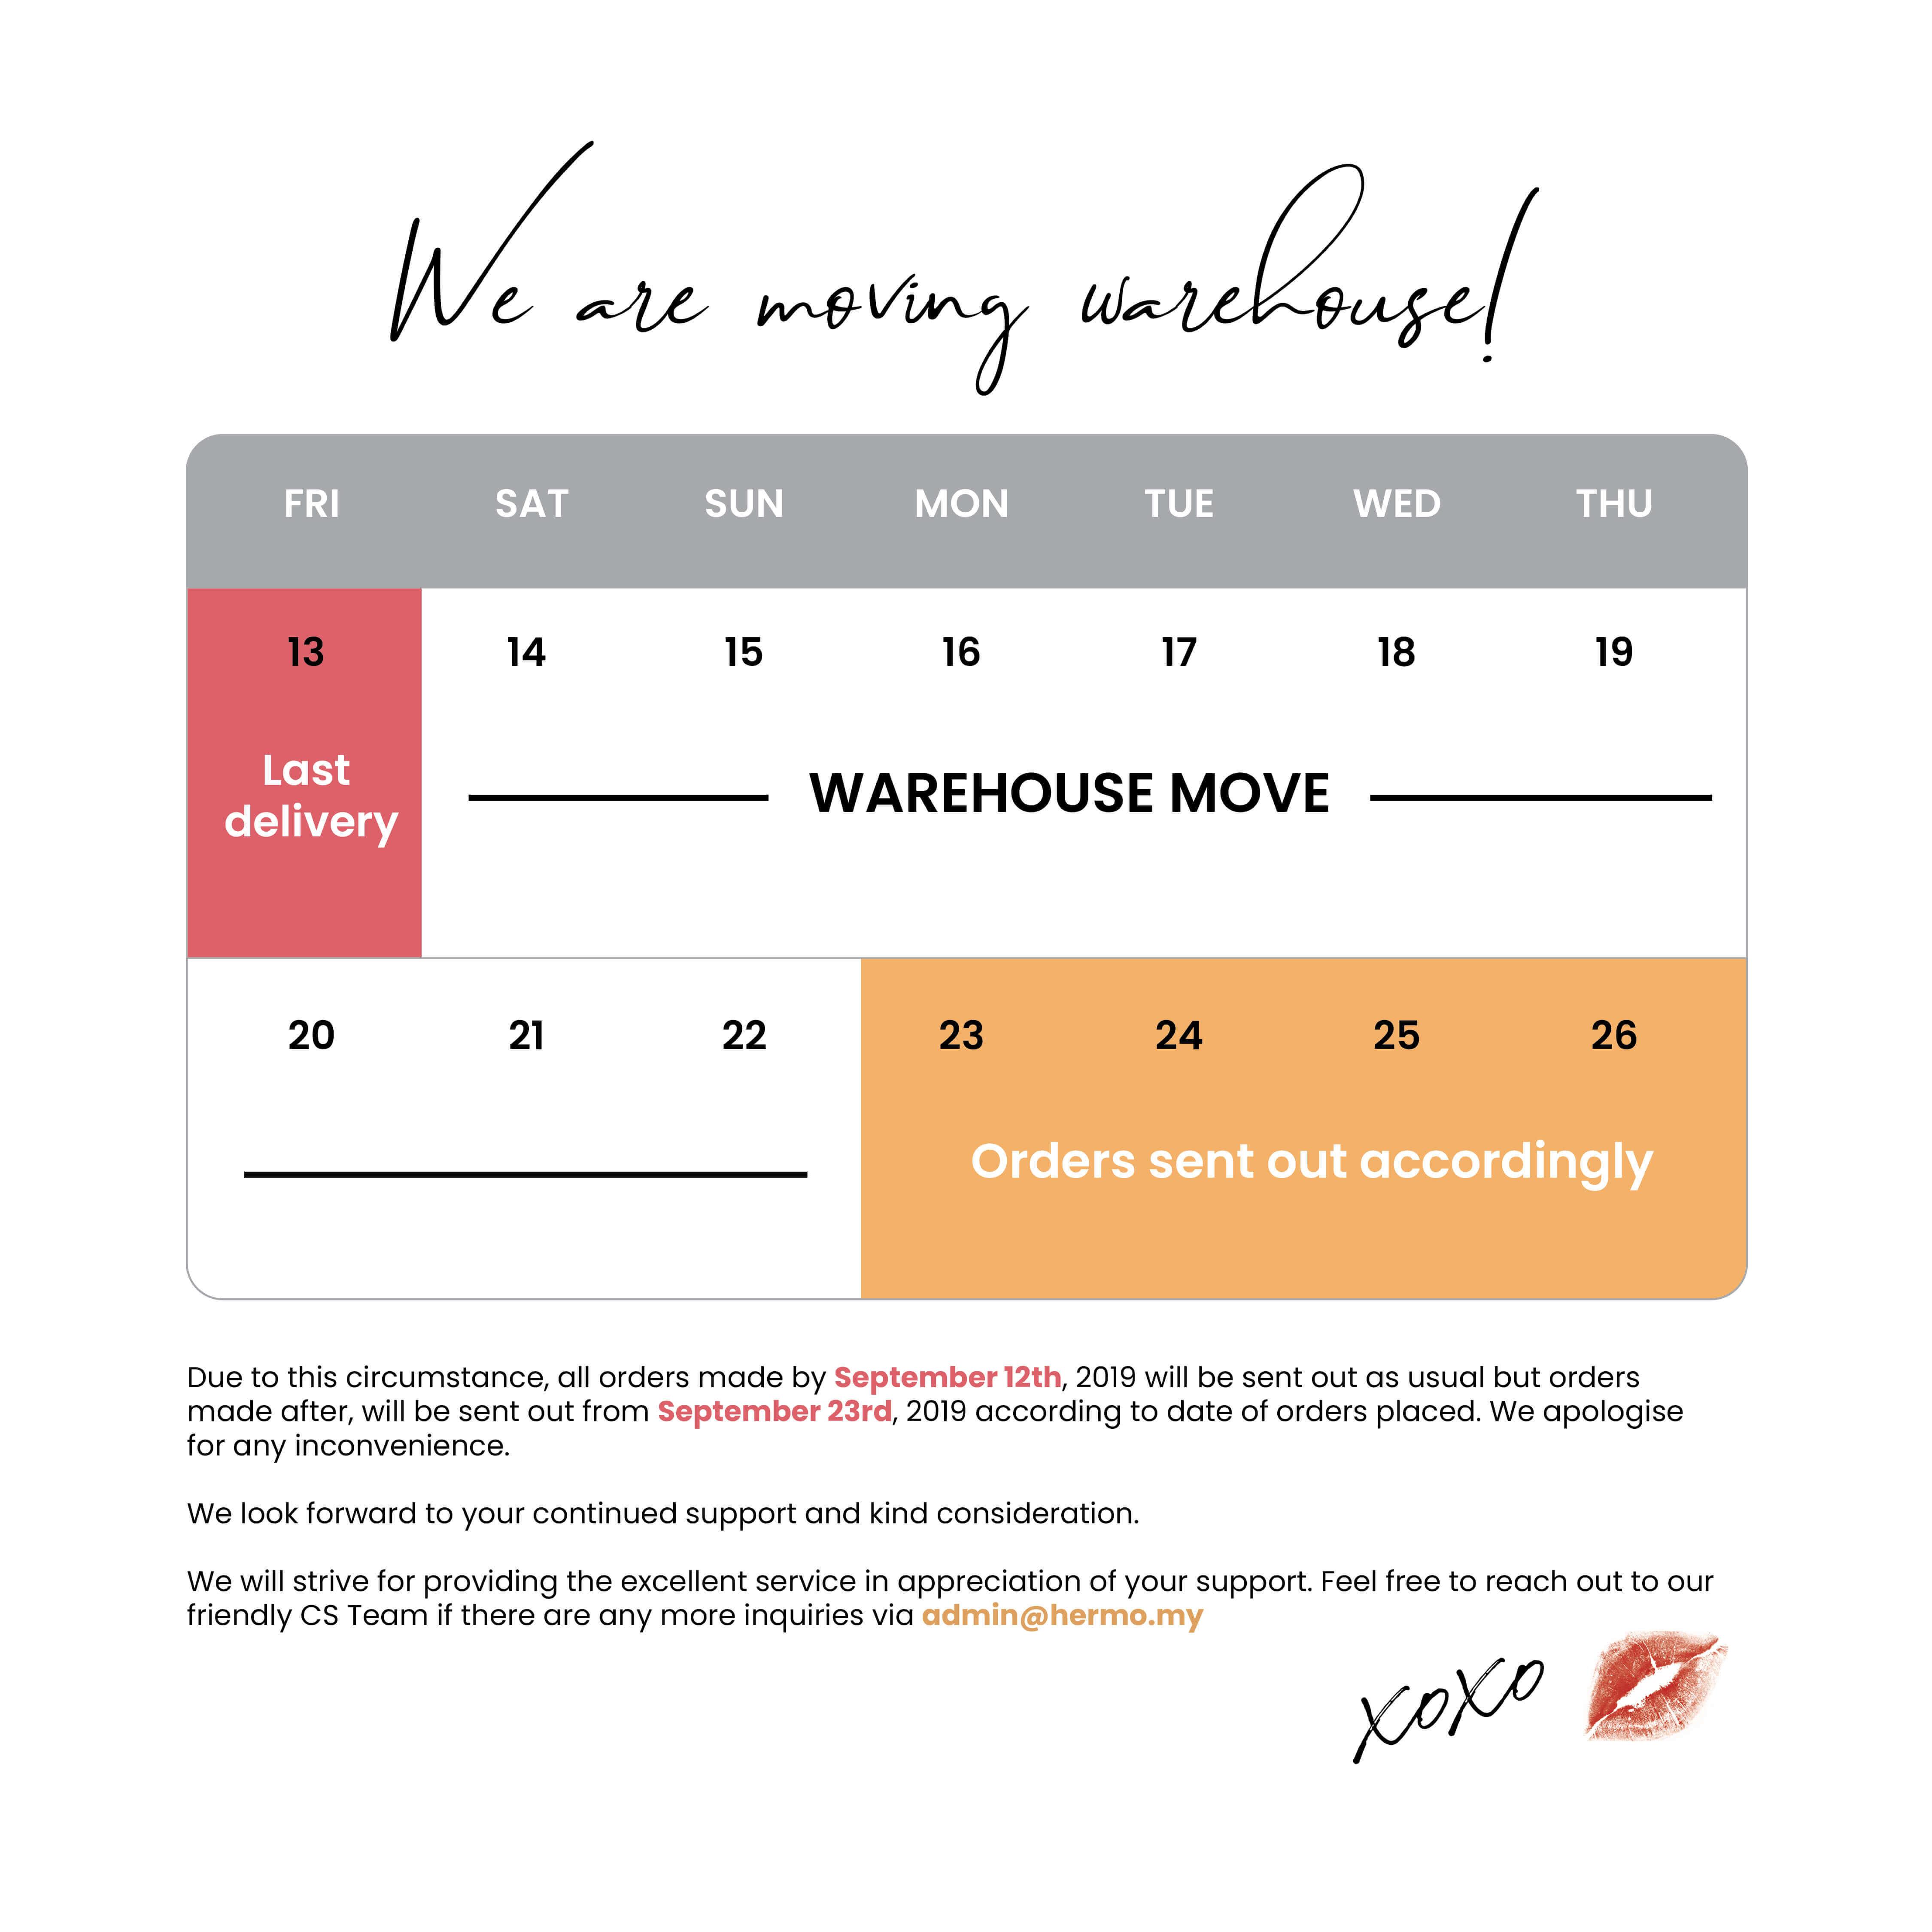 Warehouse Announcement